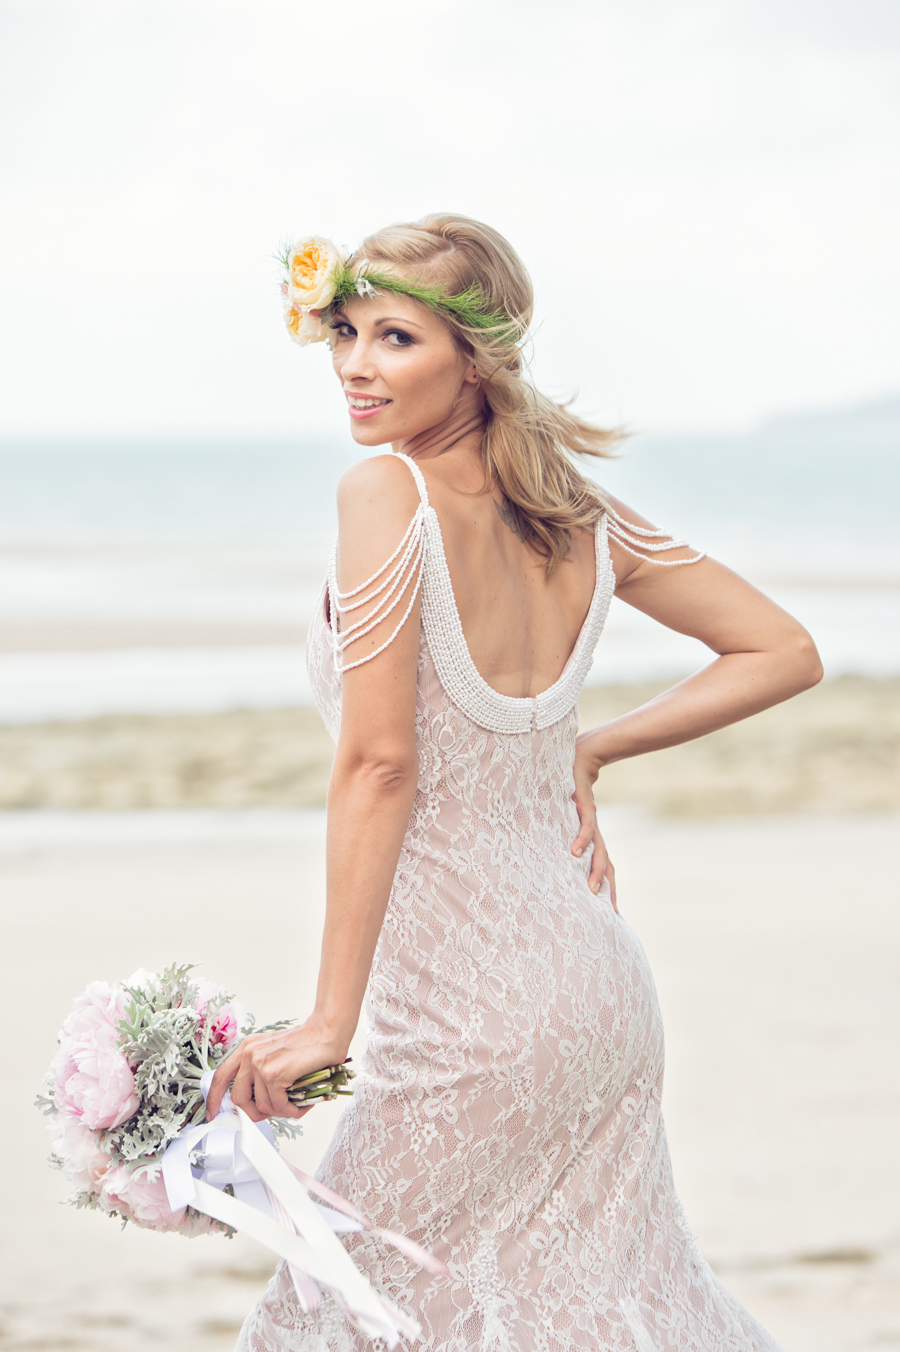 hervey bay wedding photographer-3.jpg